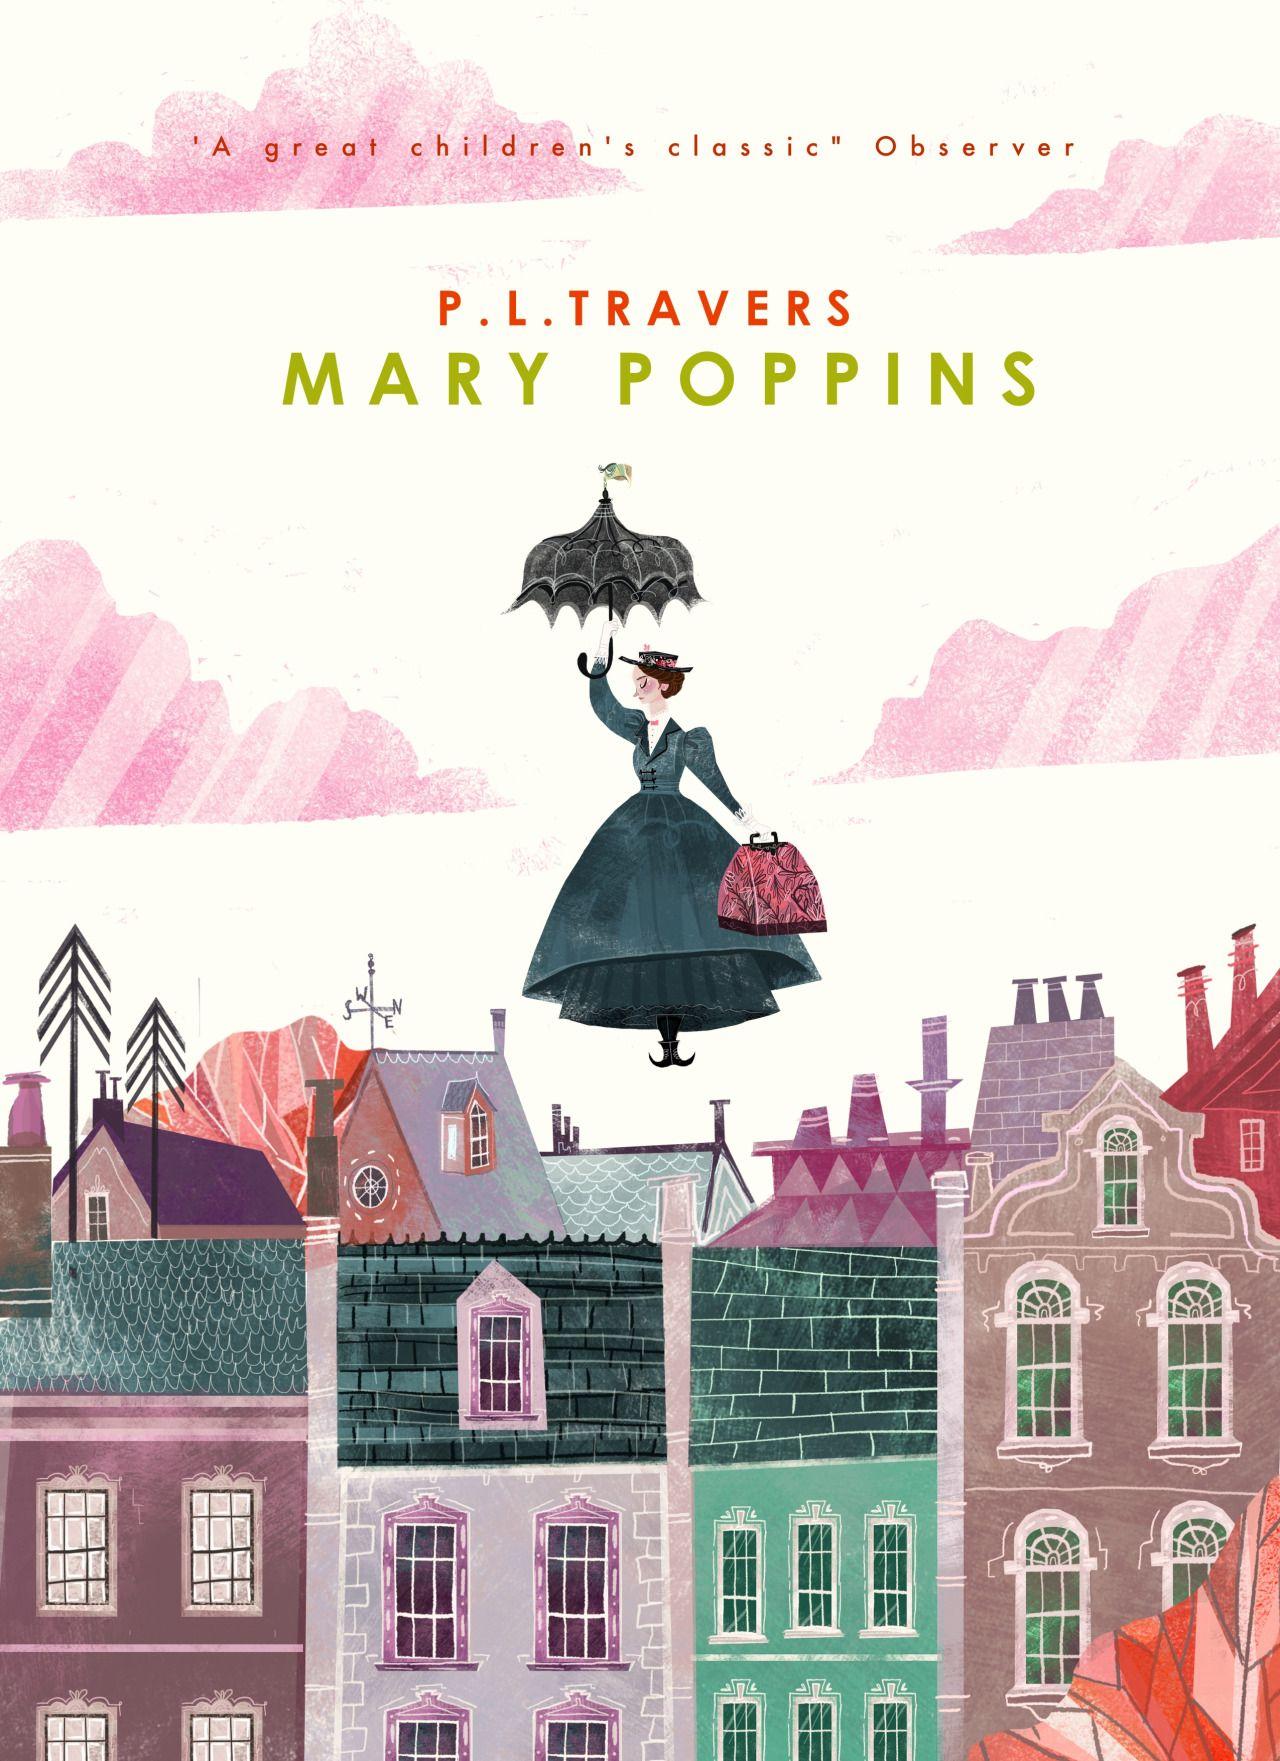 karljamesmountford: Mary Poppins book cover design By Karl James Mountford